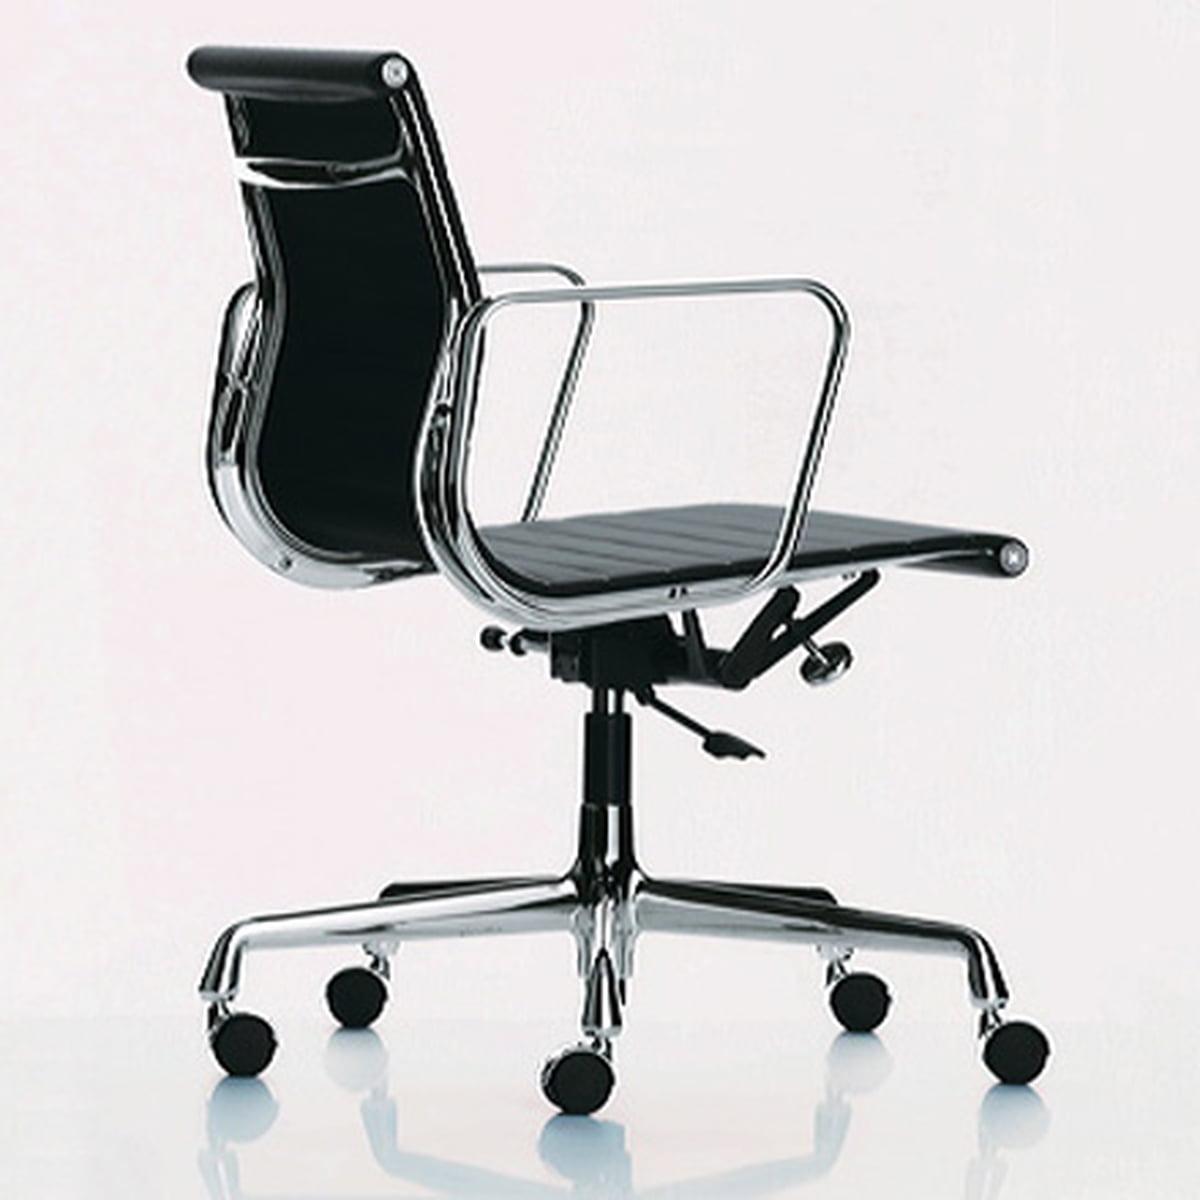 Eames Ea 117 Bureaustoel.Vitra Aluminium Group Ea 117 Bureaustoel Connox